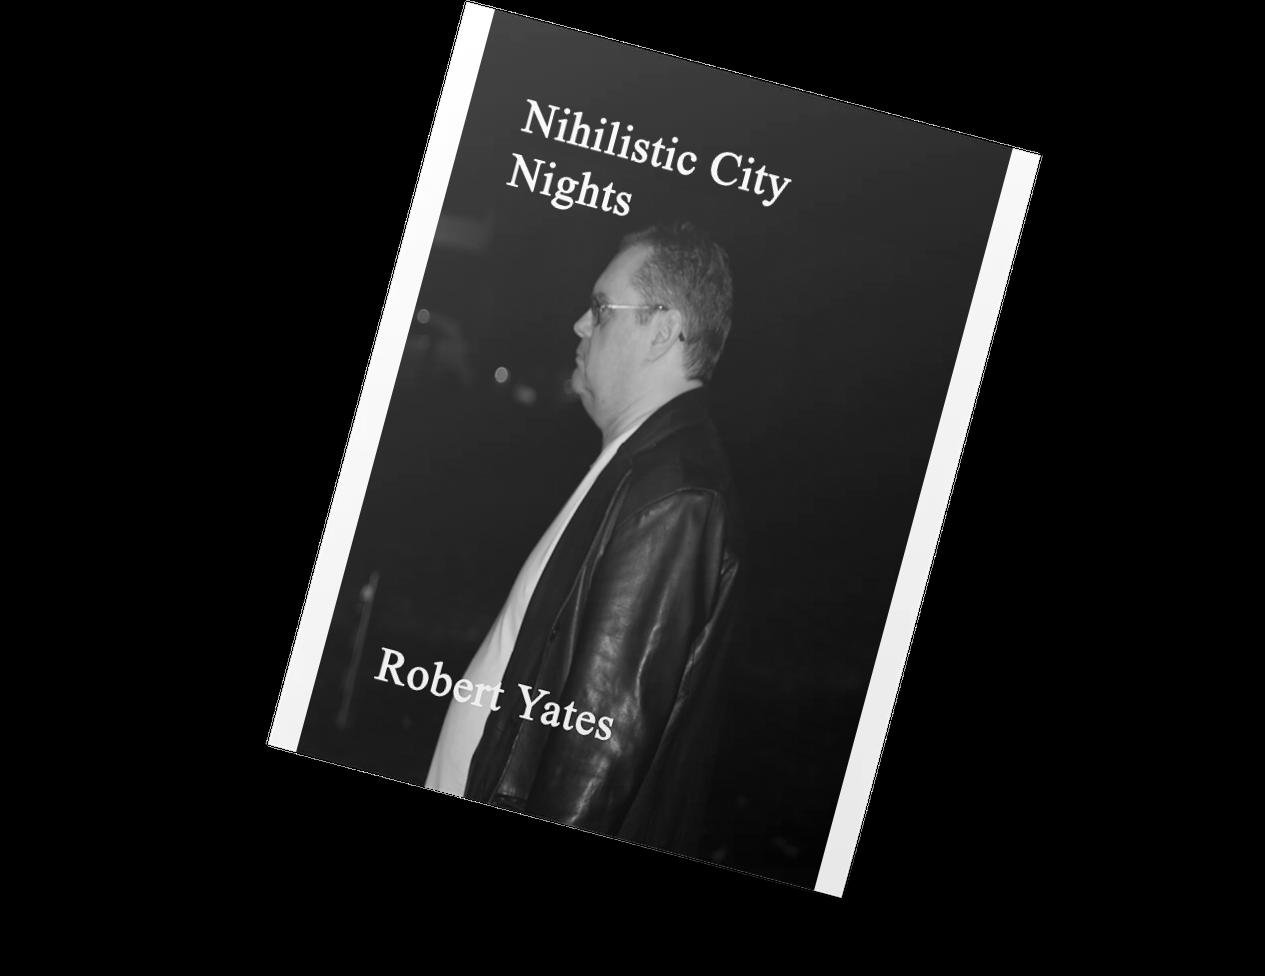 Nihilistic City Nights Robert Yates poetry book